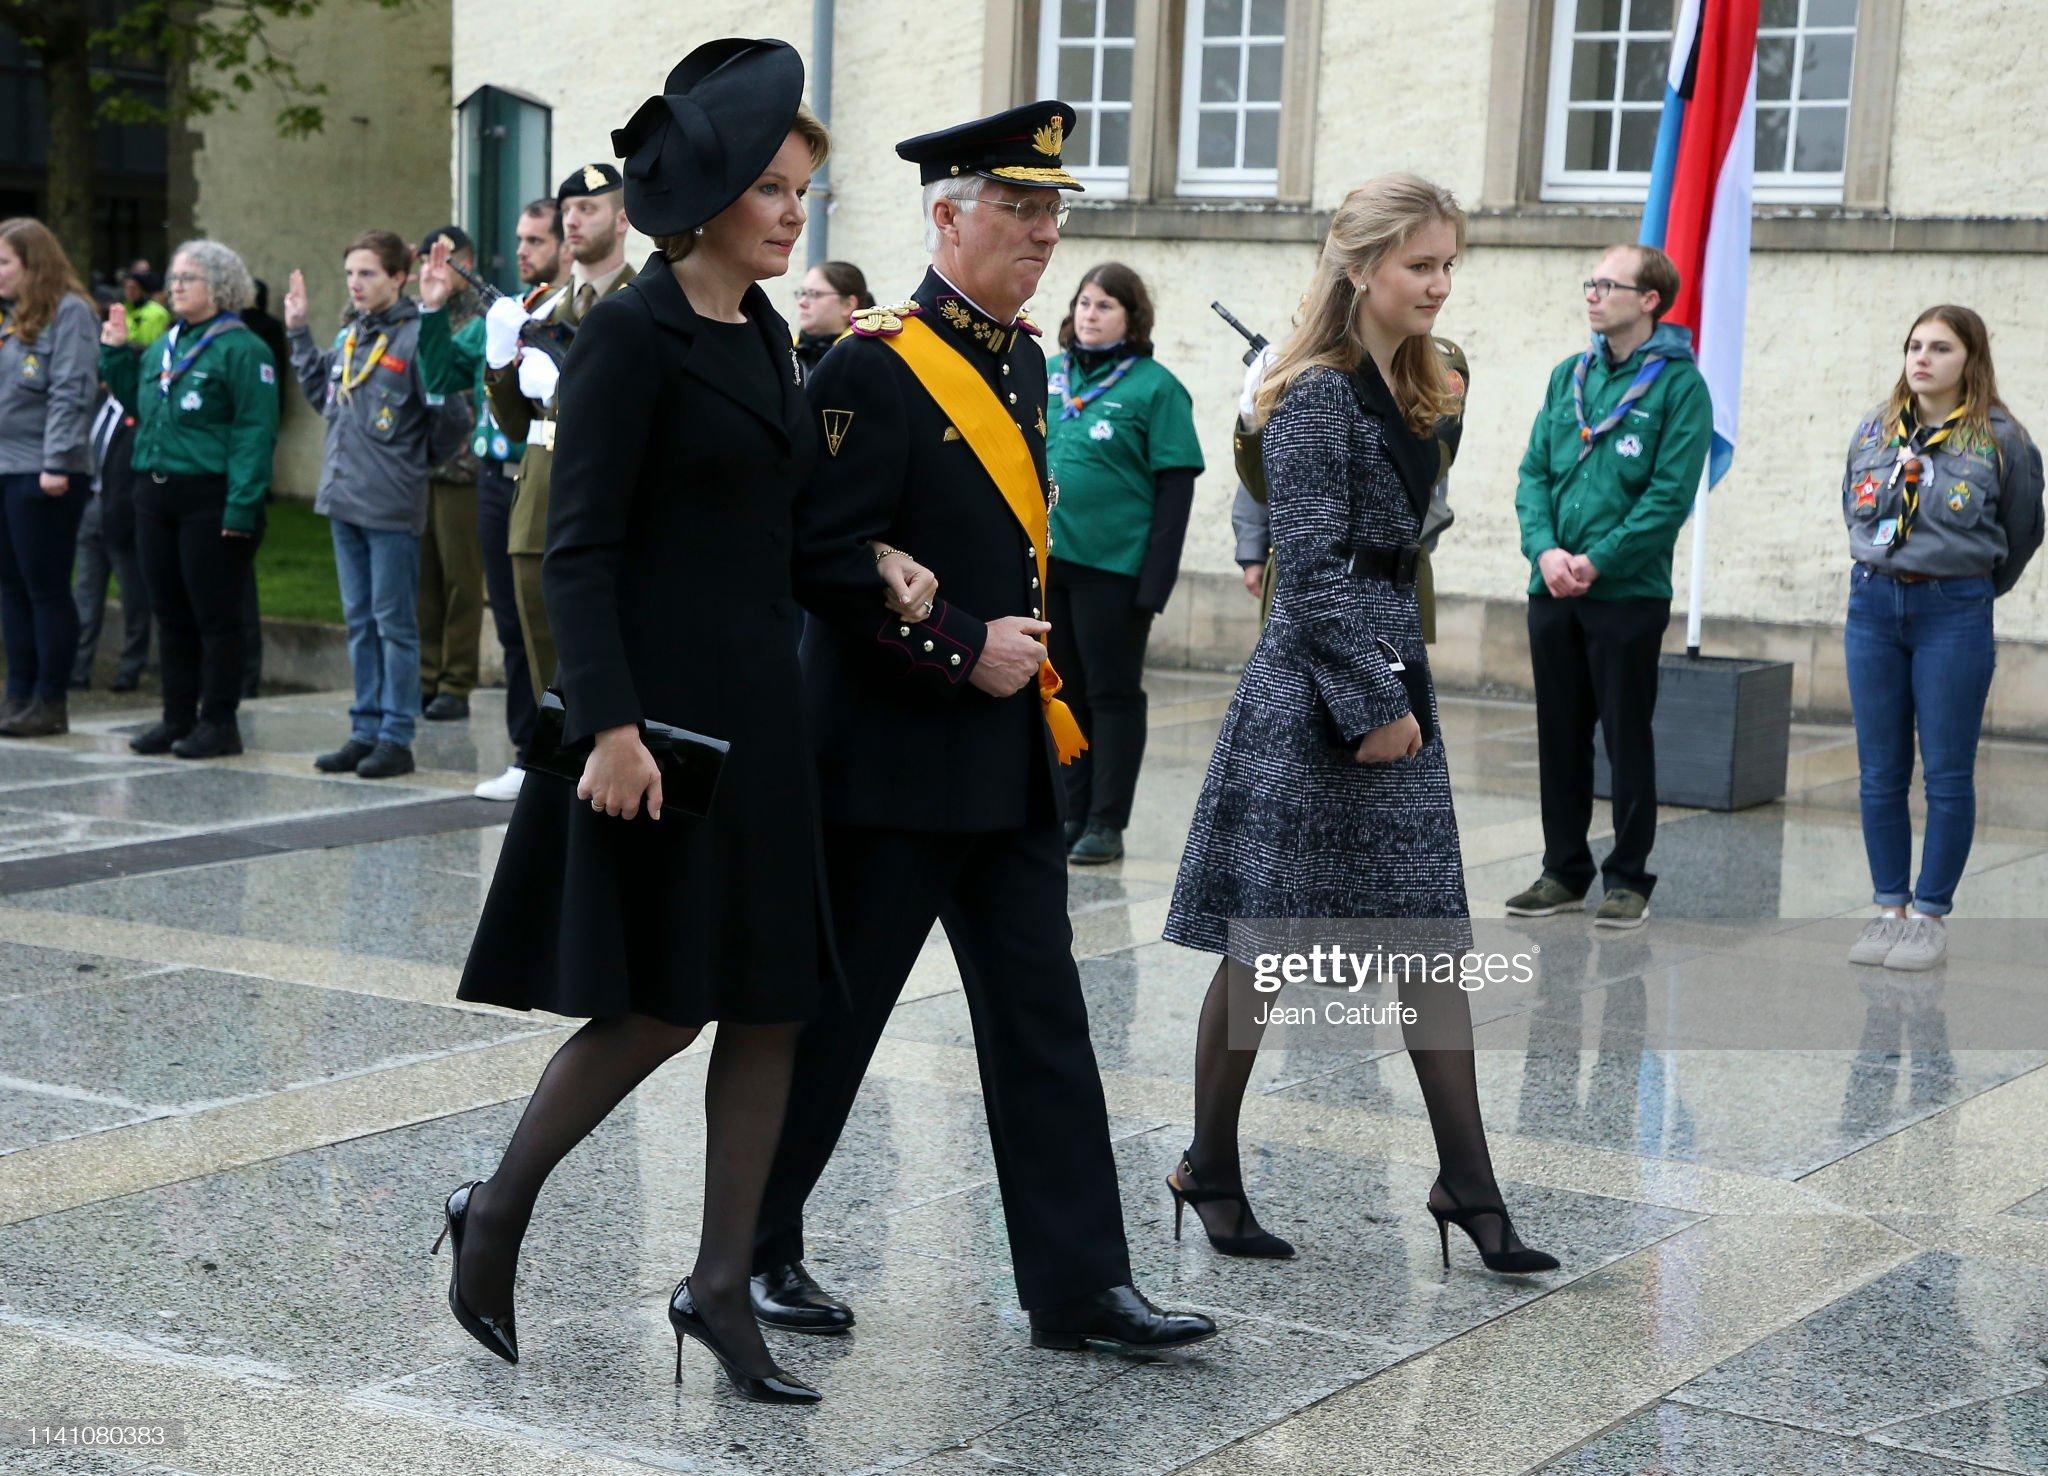 https://media.gettyimages.com/photos/king-philippe-of-belgium-queen-mathilde-of-belgium-princess-elisabeth-picture-id1141080383?s=2048x2048